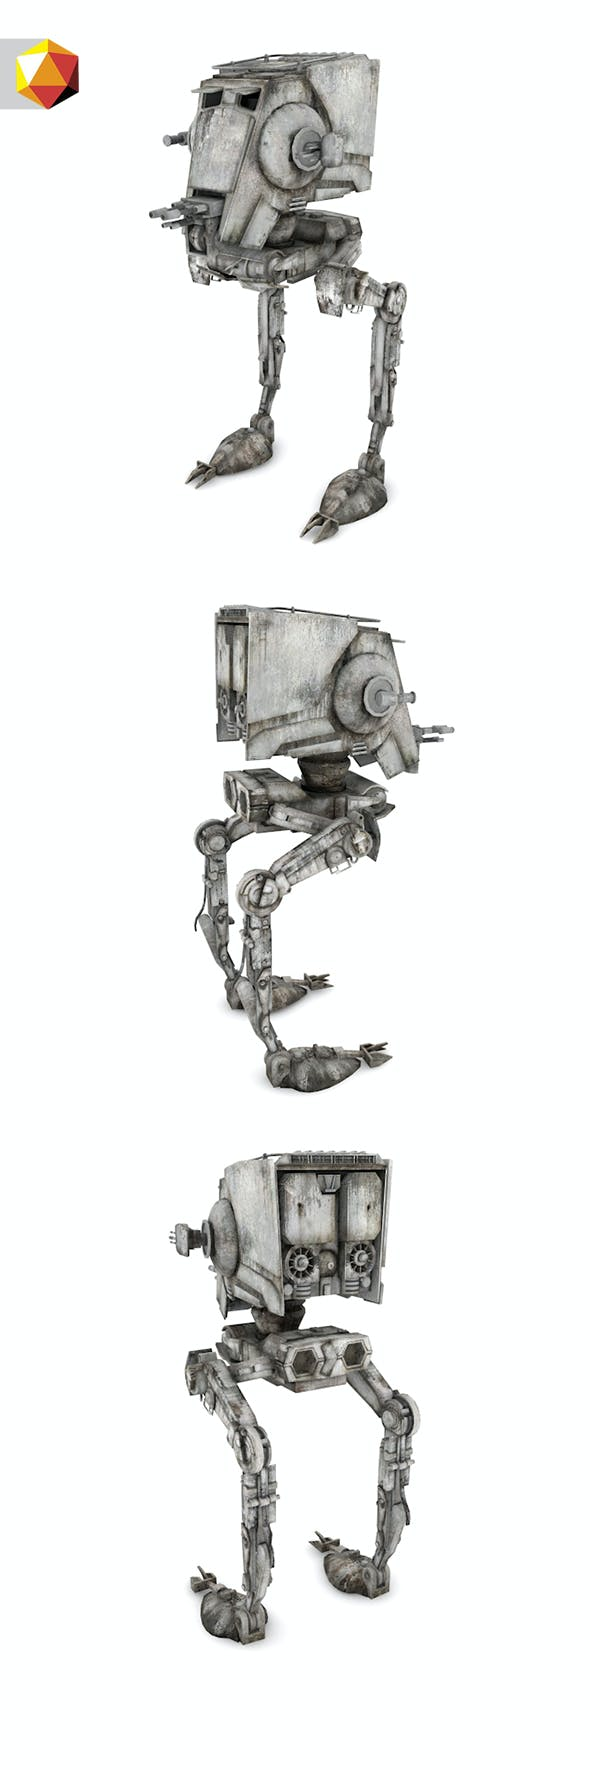 ATST 3D Model - 3DOcean Item for Sale